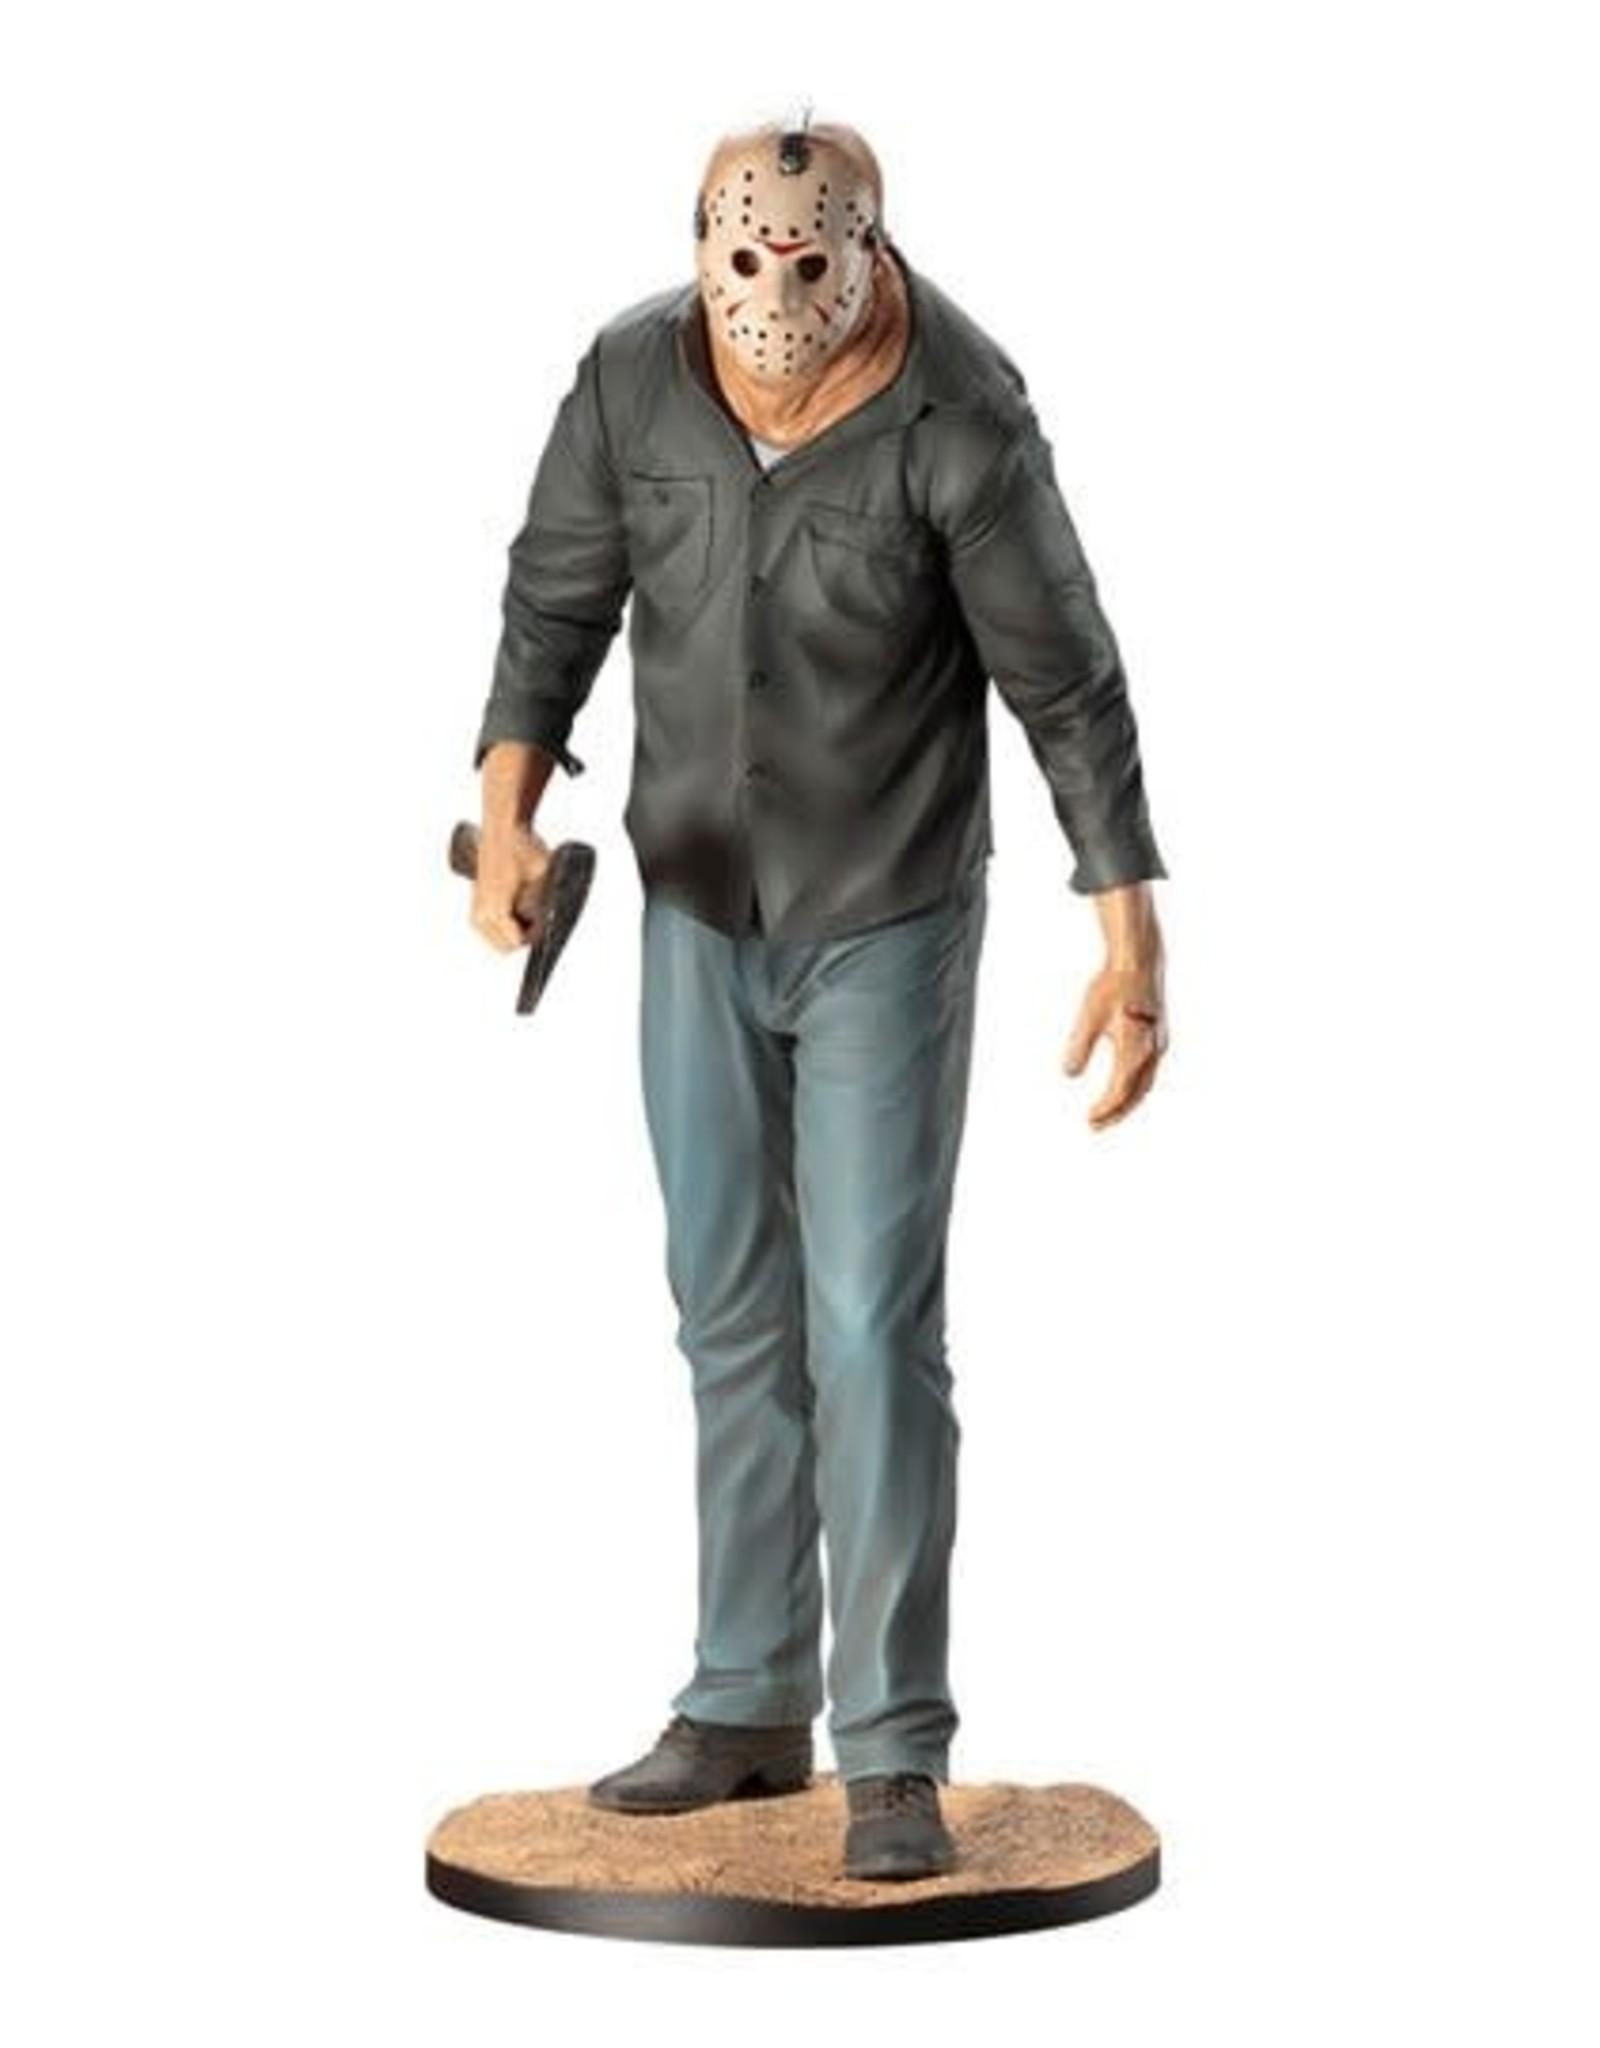 Friday the 13th Part III ARTFX Statue 1/6 Jason Voorhees 28 cm